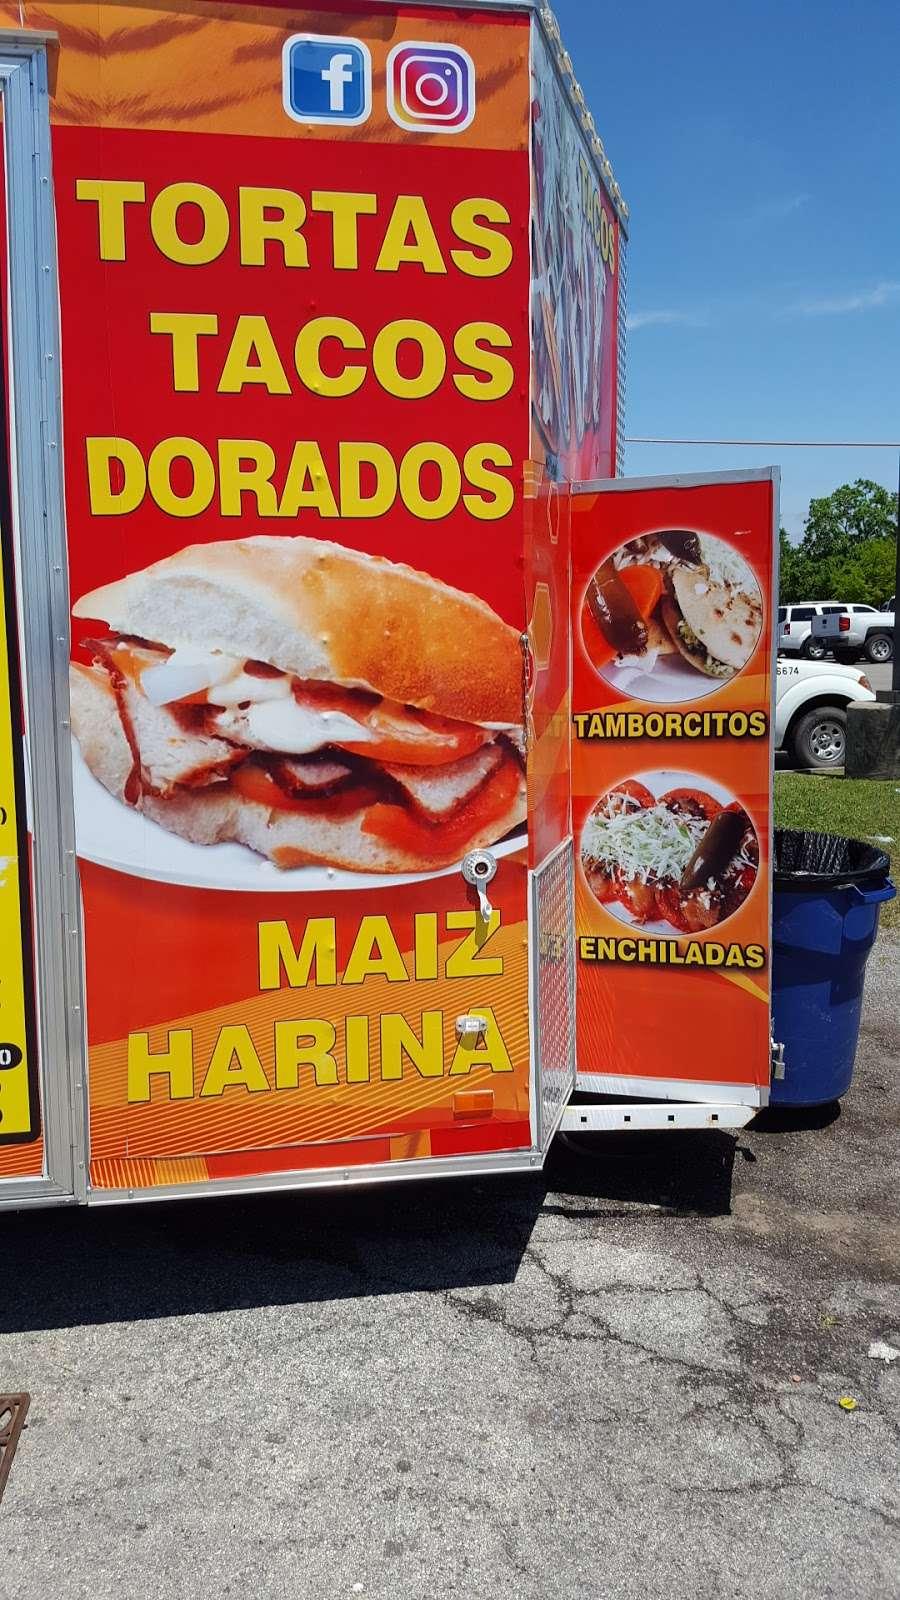 Tortas el TIGRE - restaurant    Photo 10 of 10   Address: 10501 Telephone Rd, Houston, TX 77075, USA   Phone: (832) 353-0594